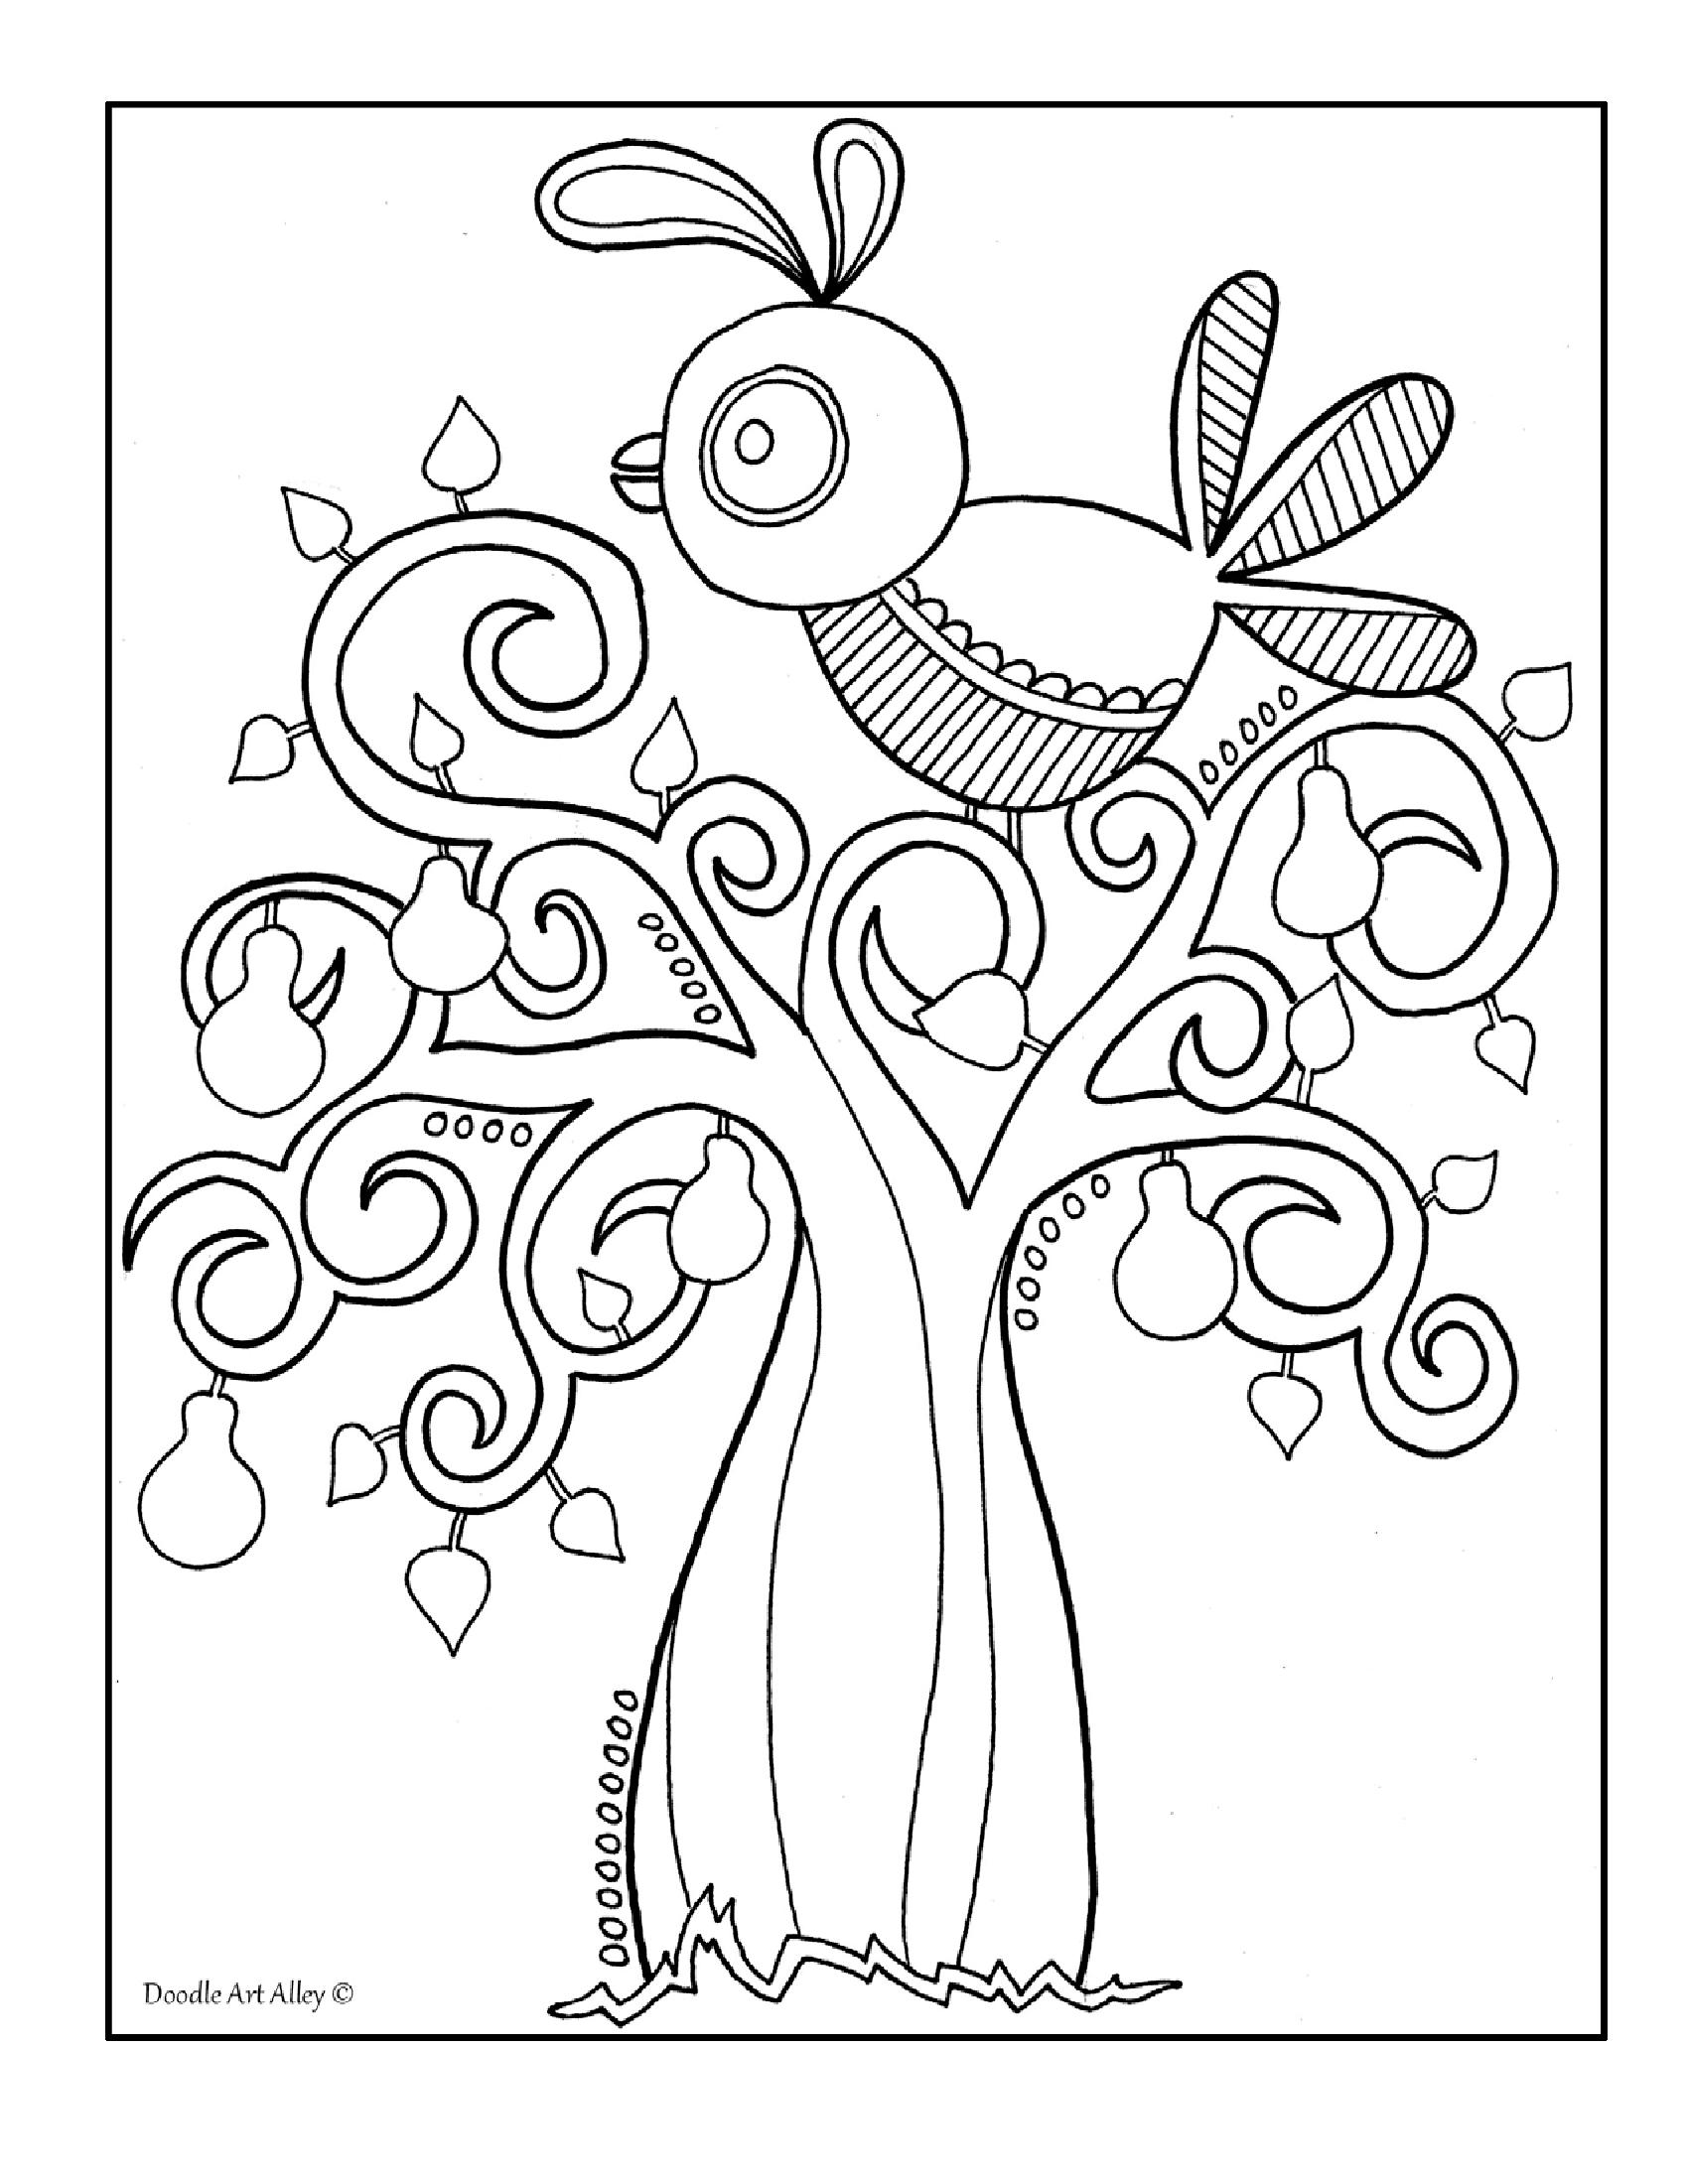 Twelve Days of Christmas doodle book | Holiday Ideas | Pinterest ...